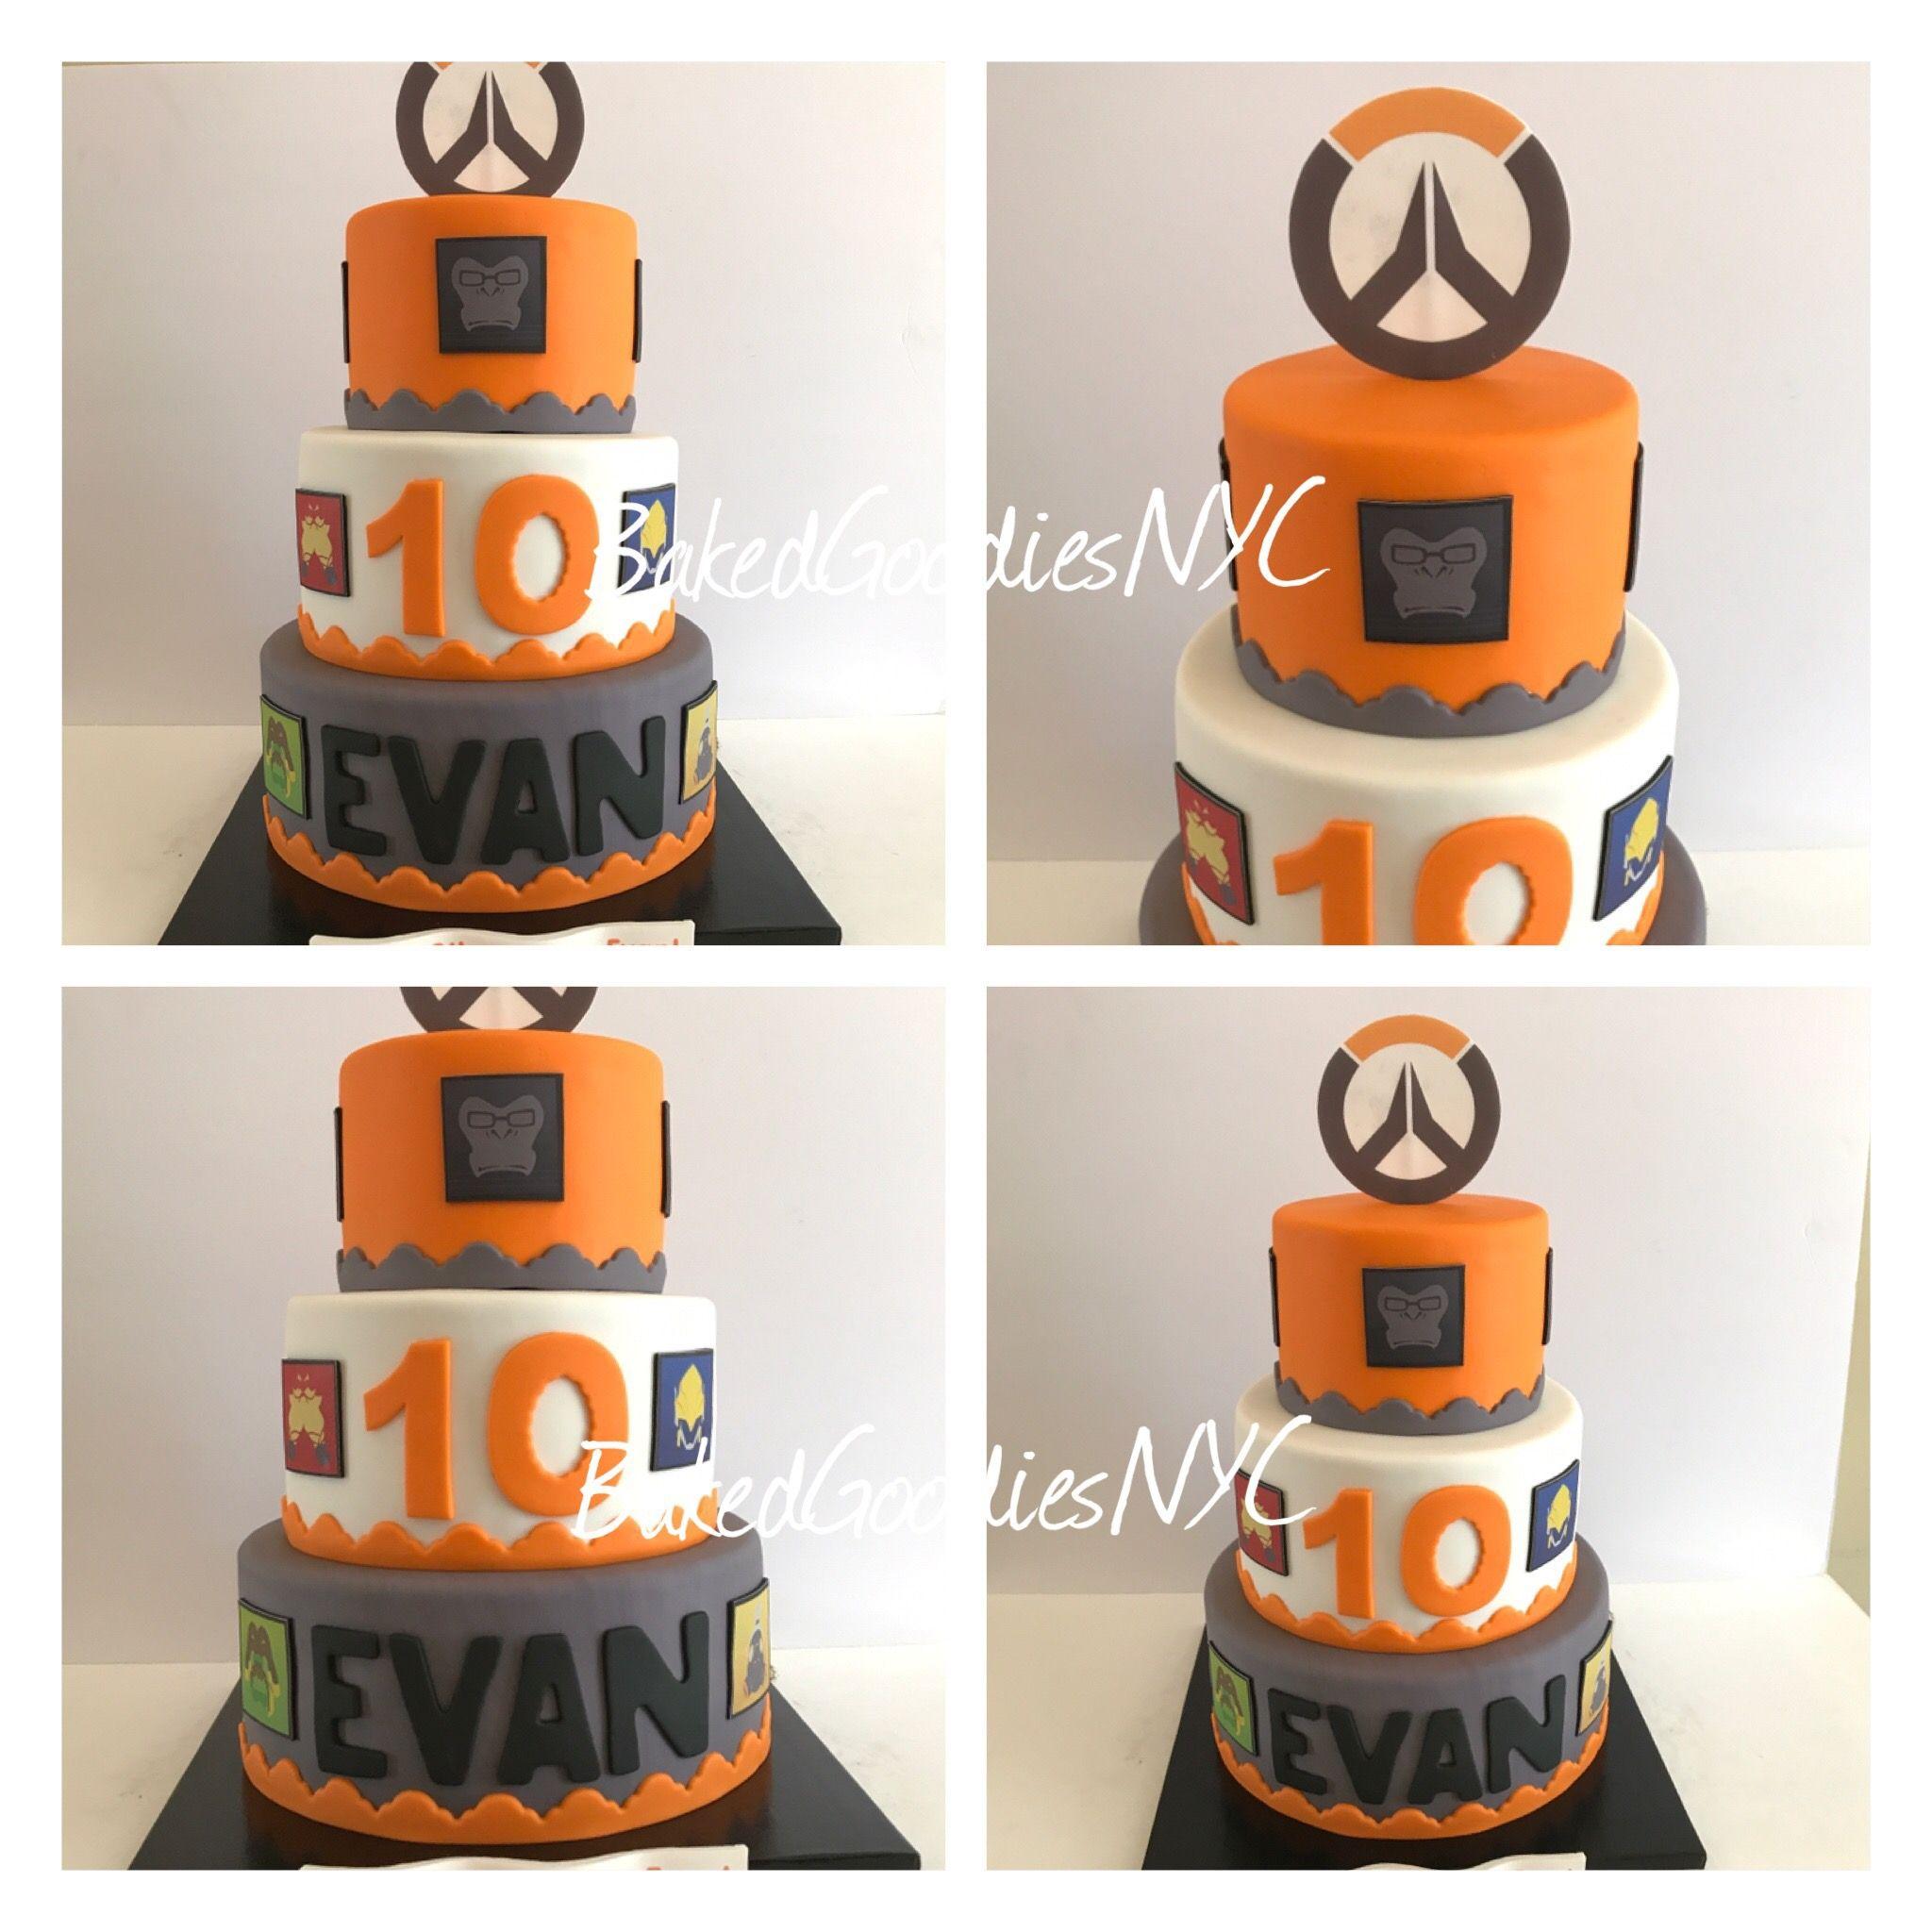 OVERWATCH CAKE | CAKES in 2019 | Overwatch cake, Overwatch birthday ...